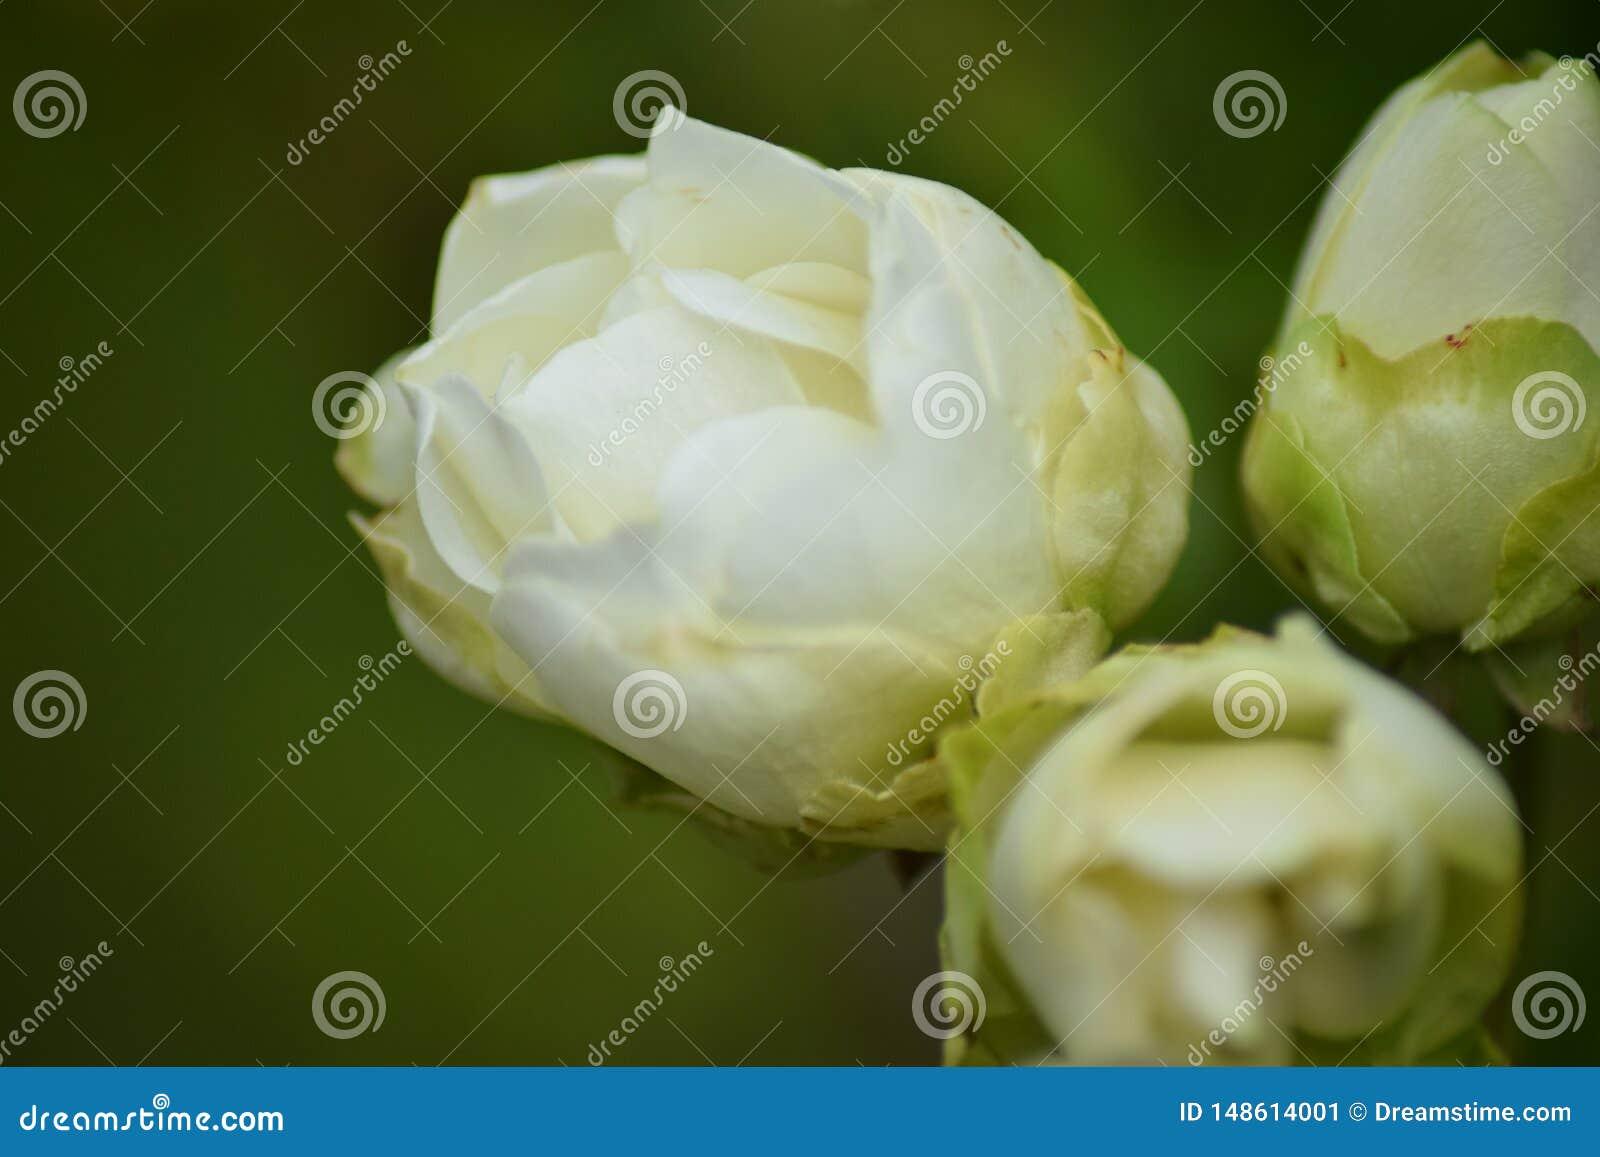 Rustic white garden rose